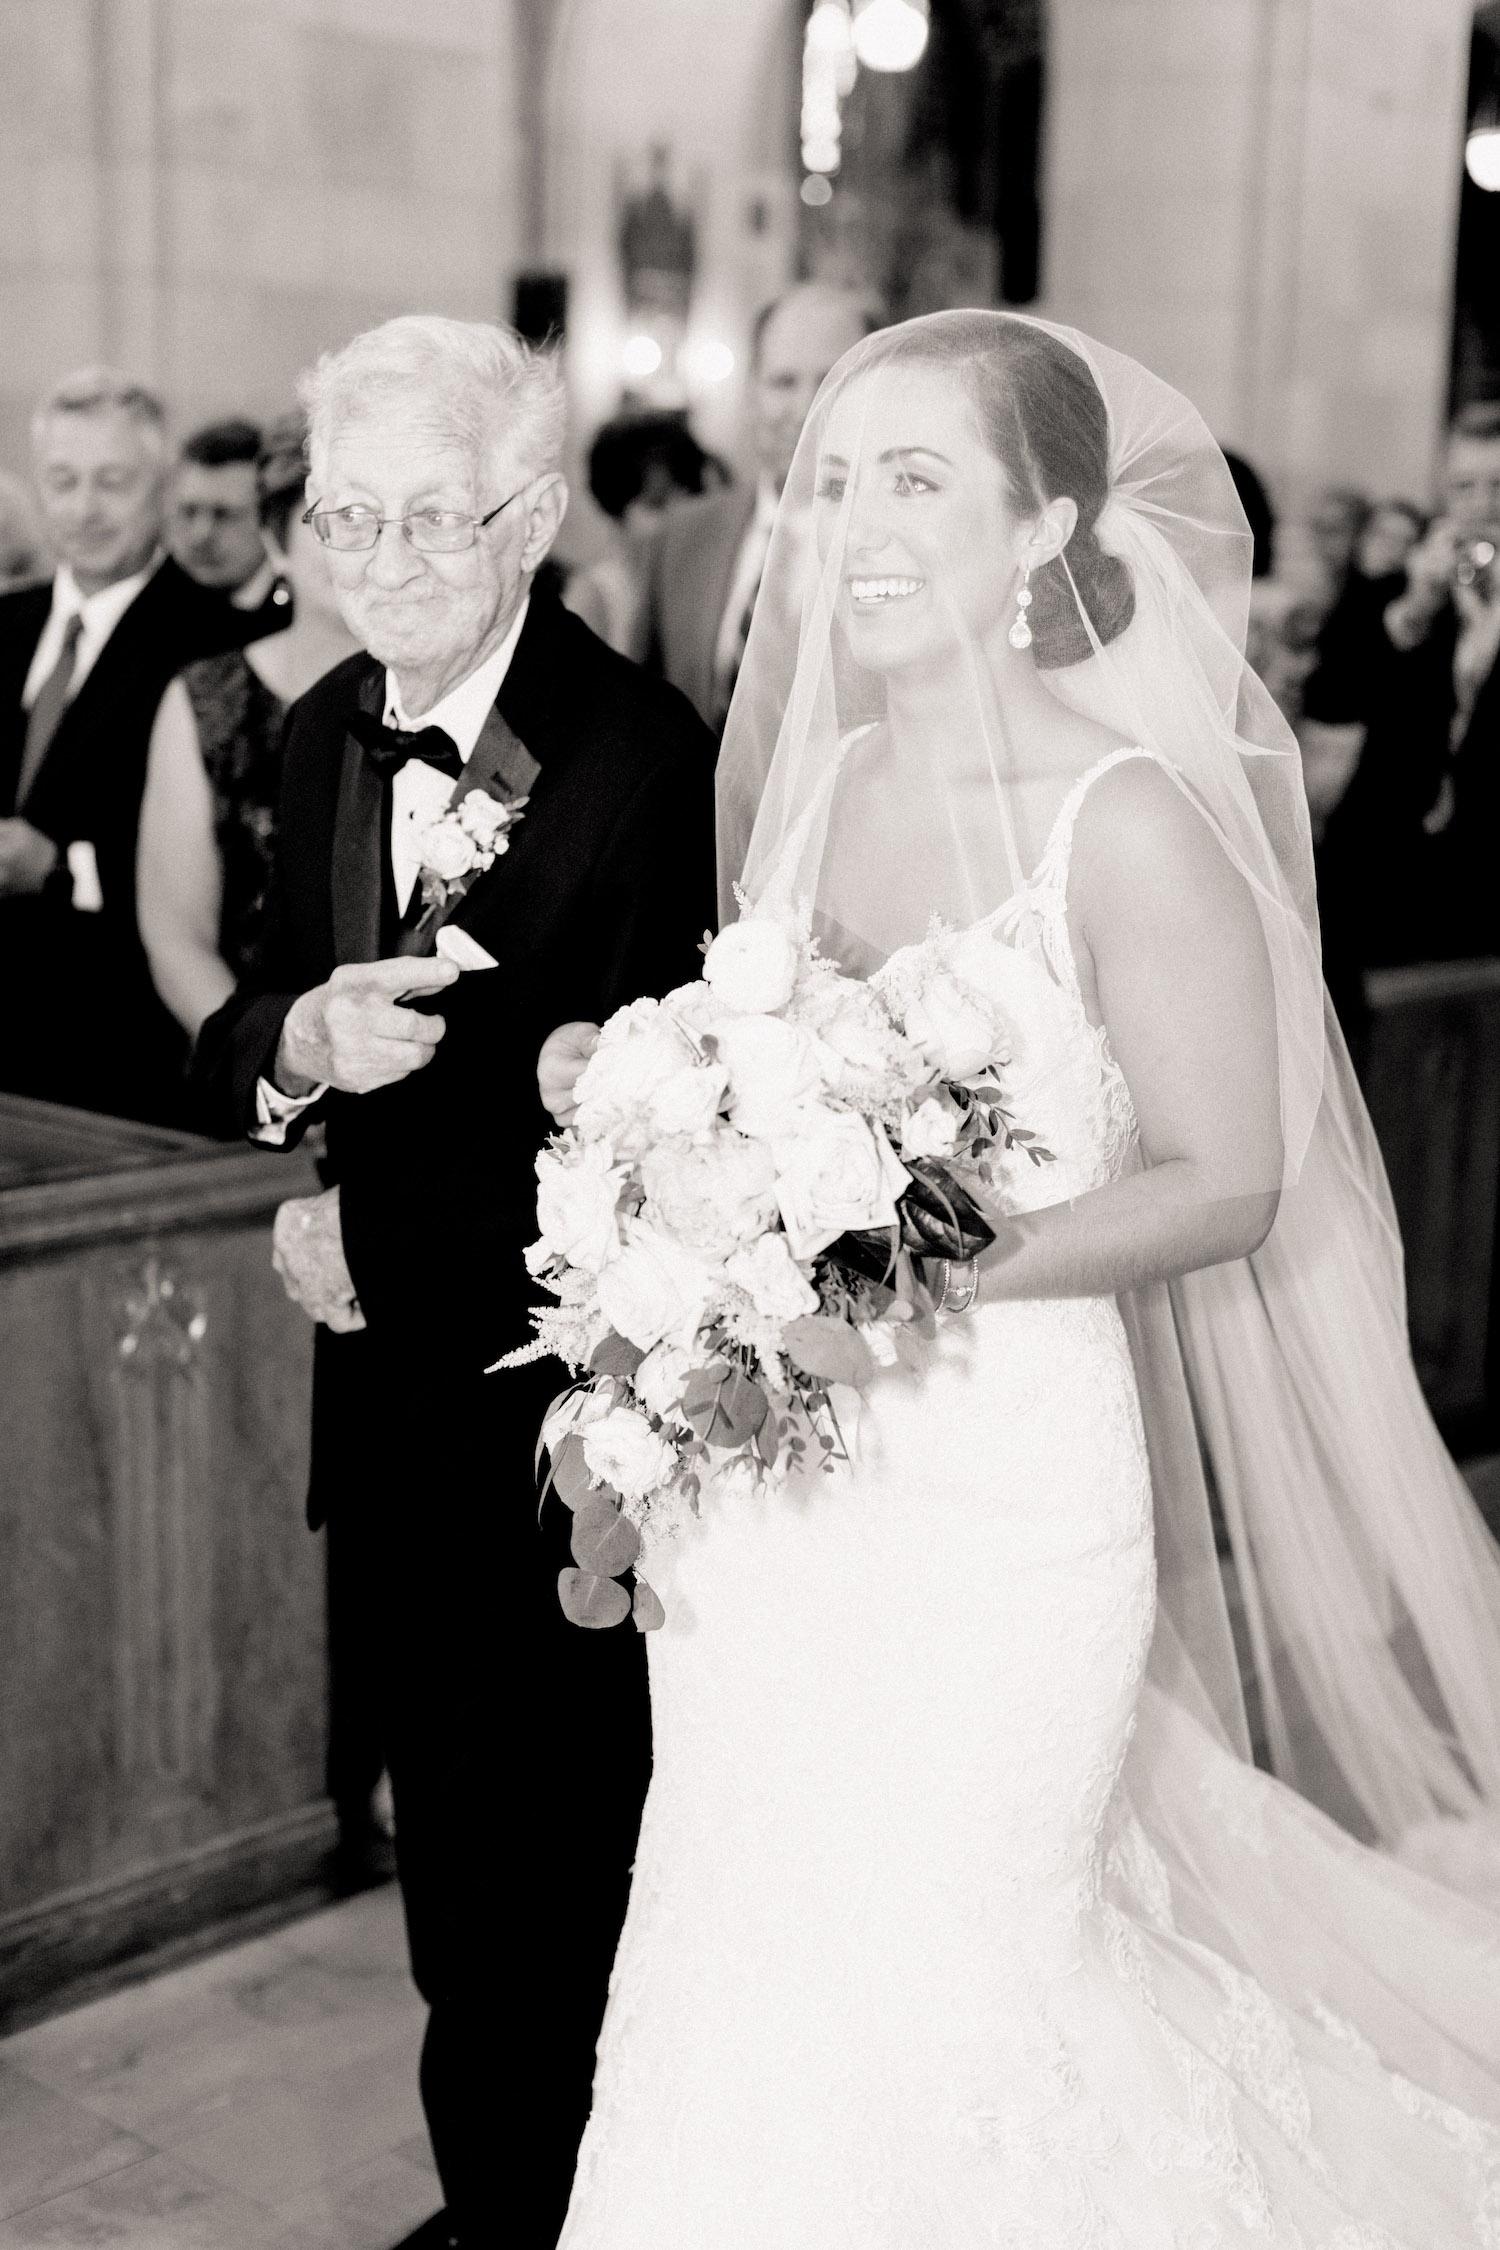 Toledo-Renaissance-Wedding-3092-2.jpg